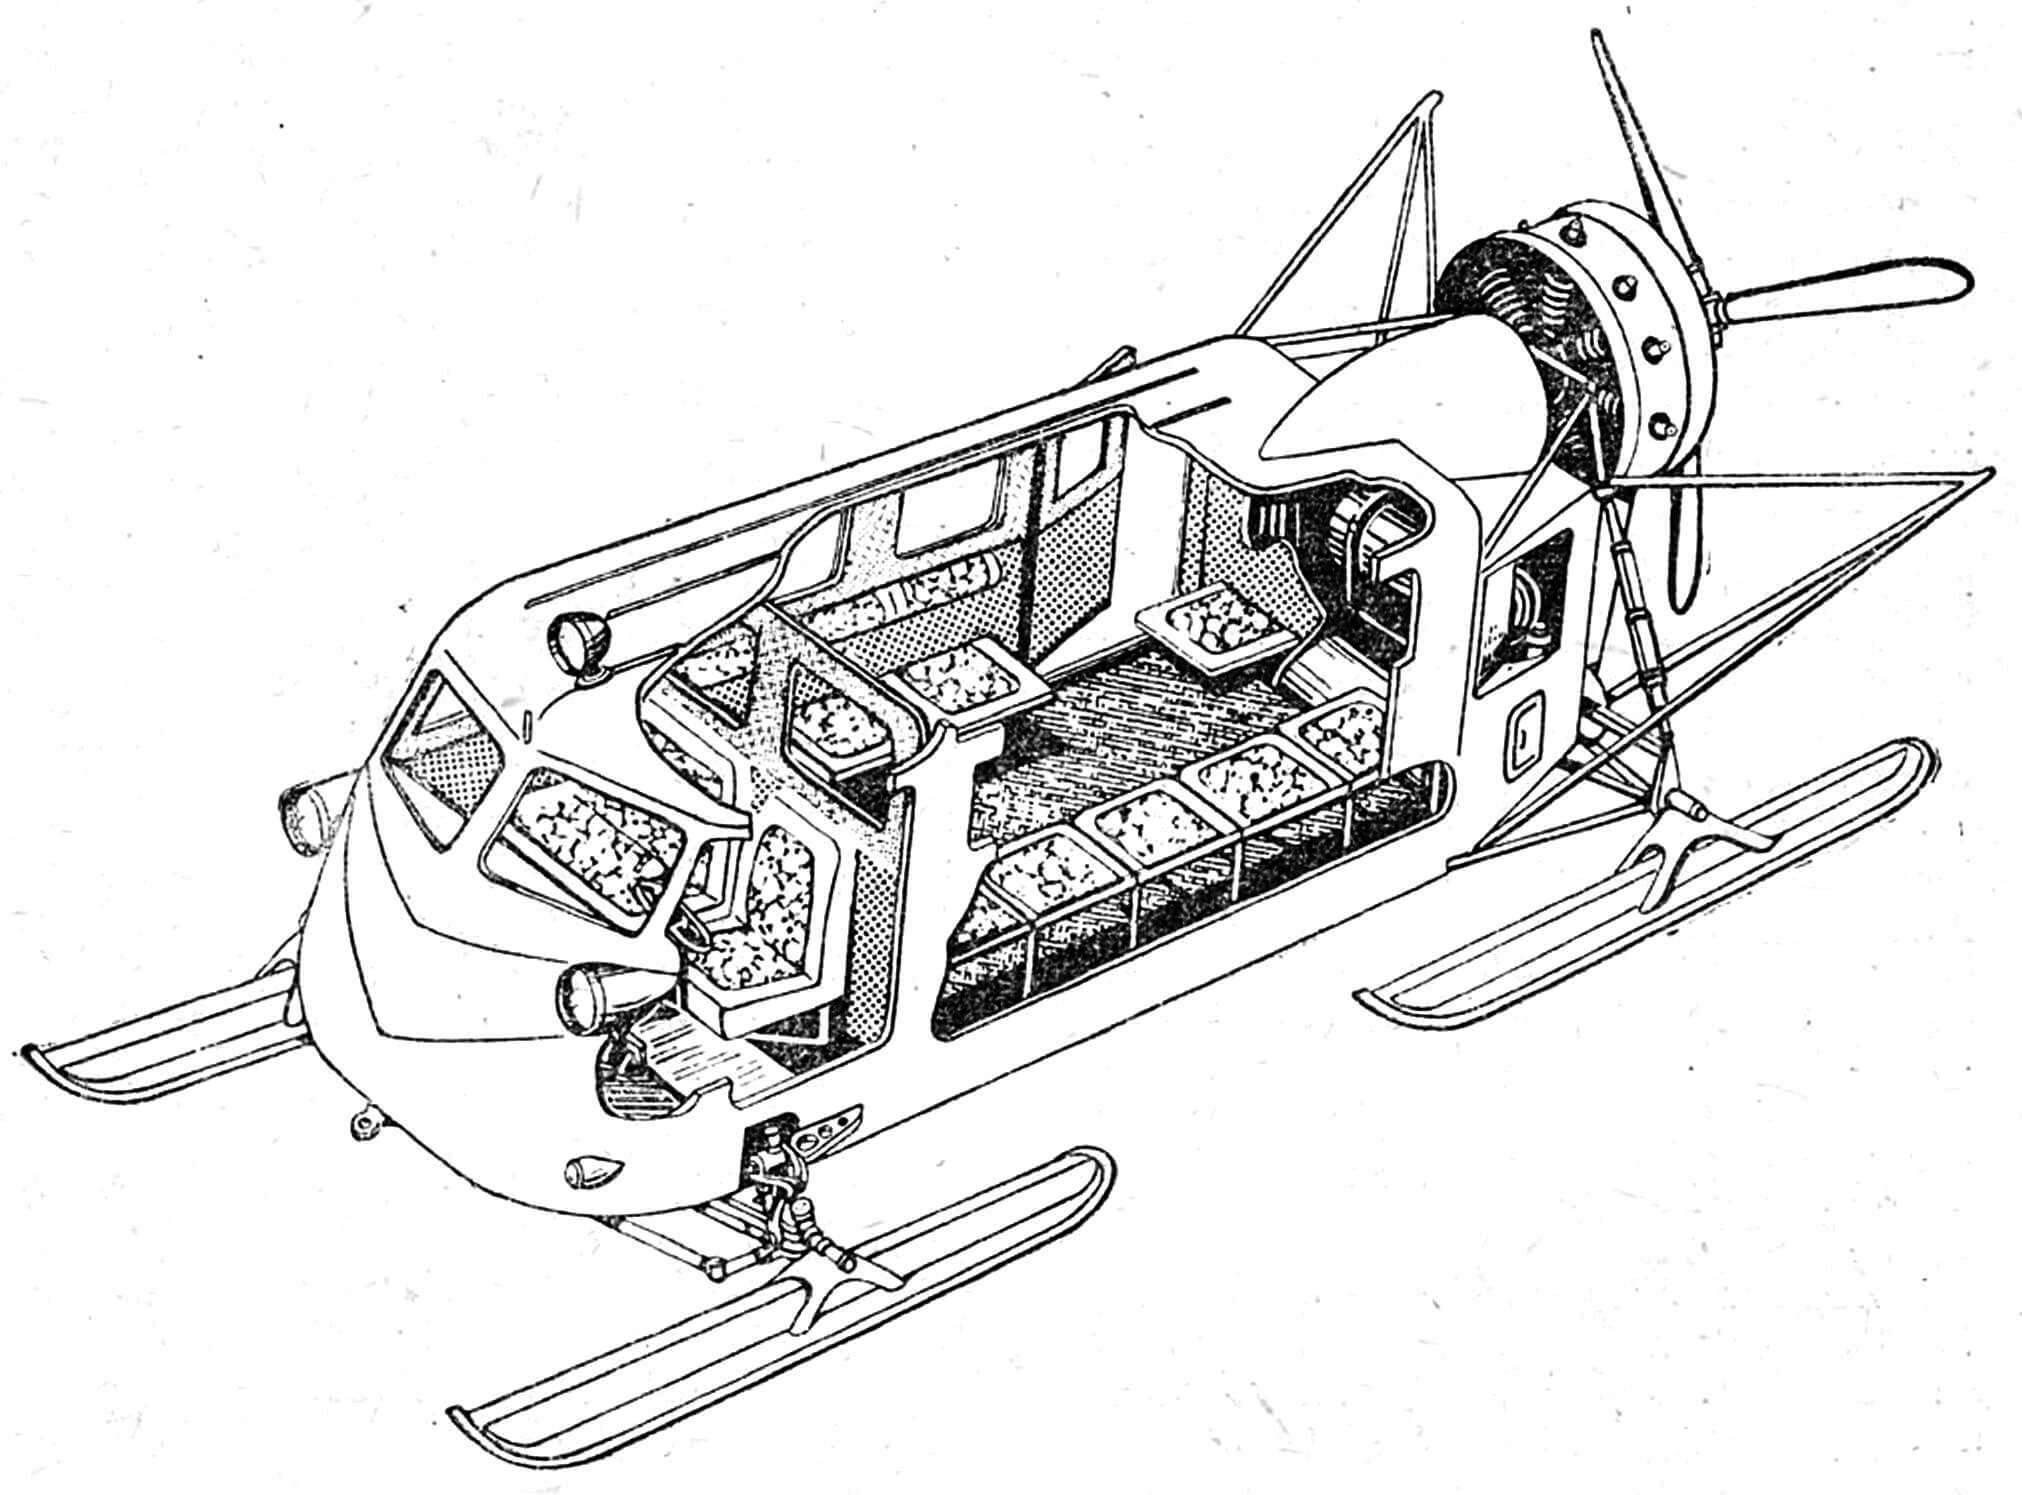 Аэросани КА-30